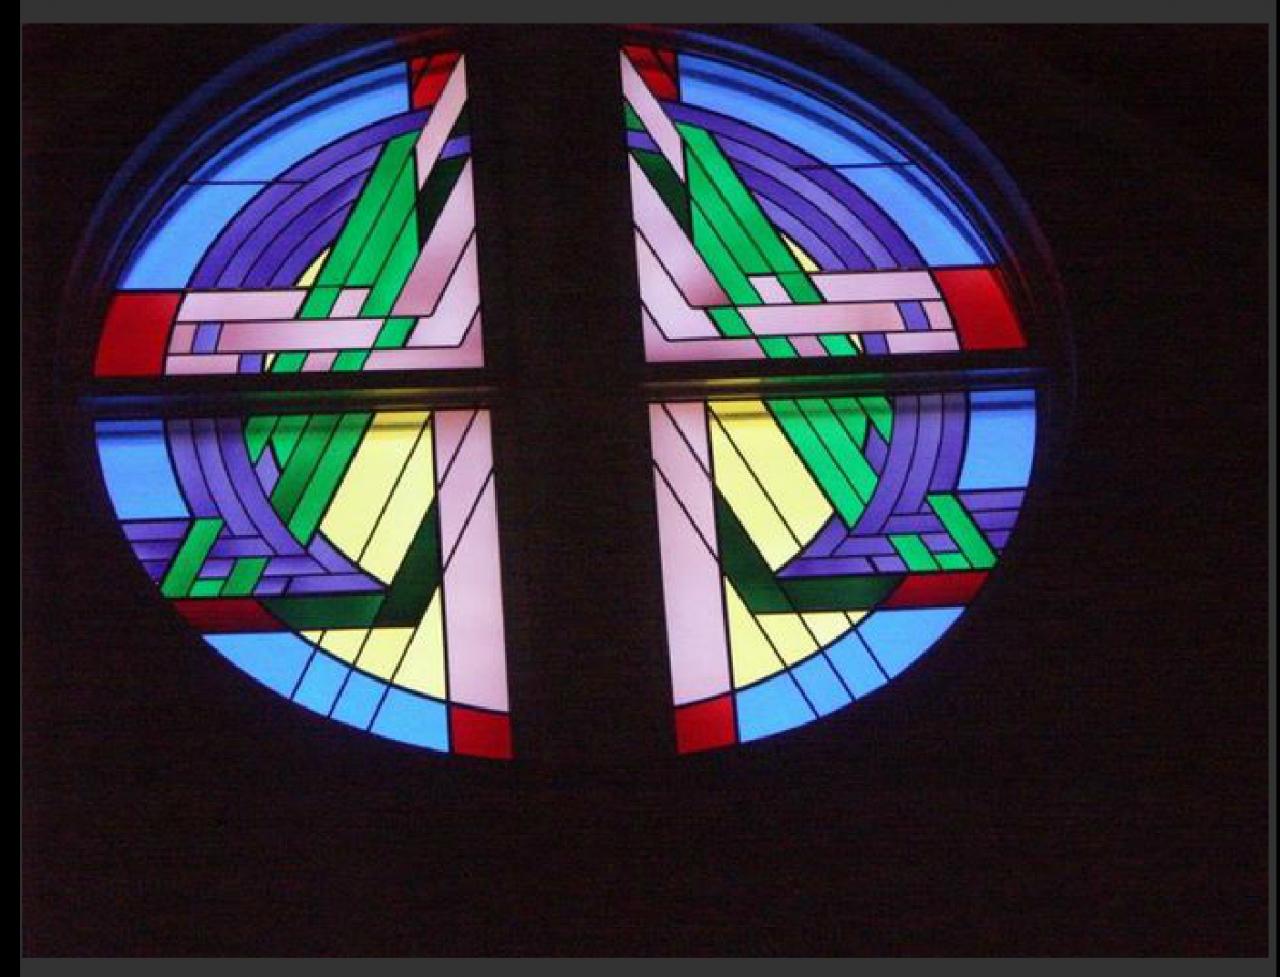 Alpha Omega, Catholic Church